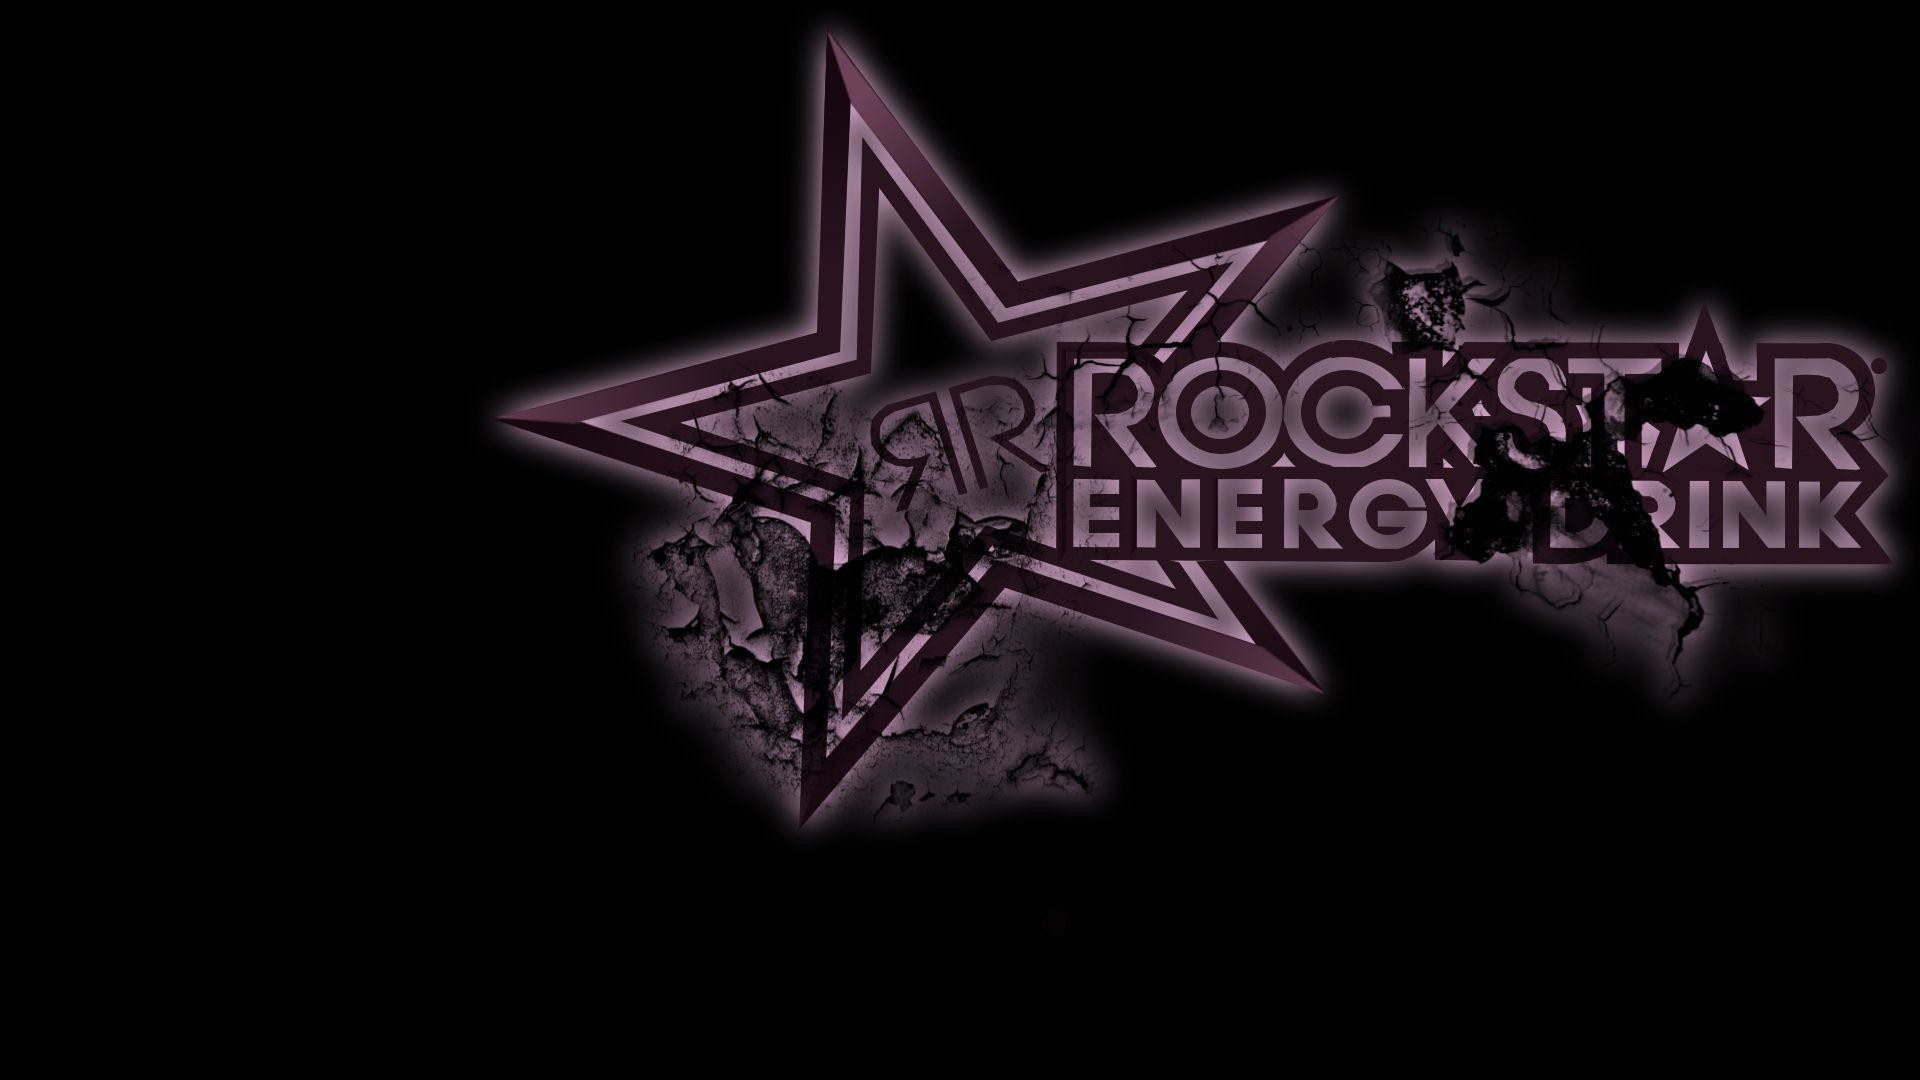 Res: 1920x1080, Rockstar Energy Backgrounds Wallpaper Cave